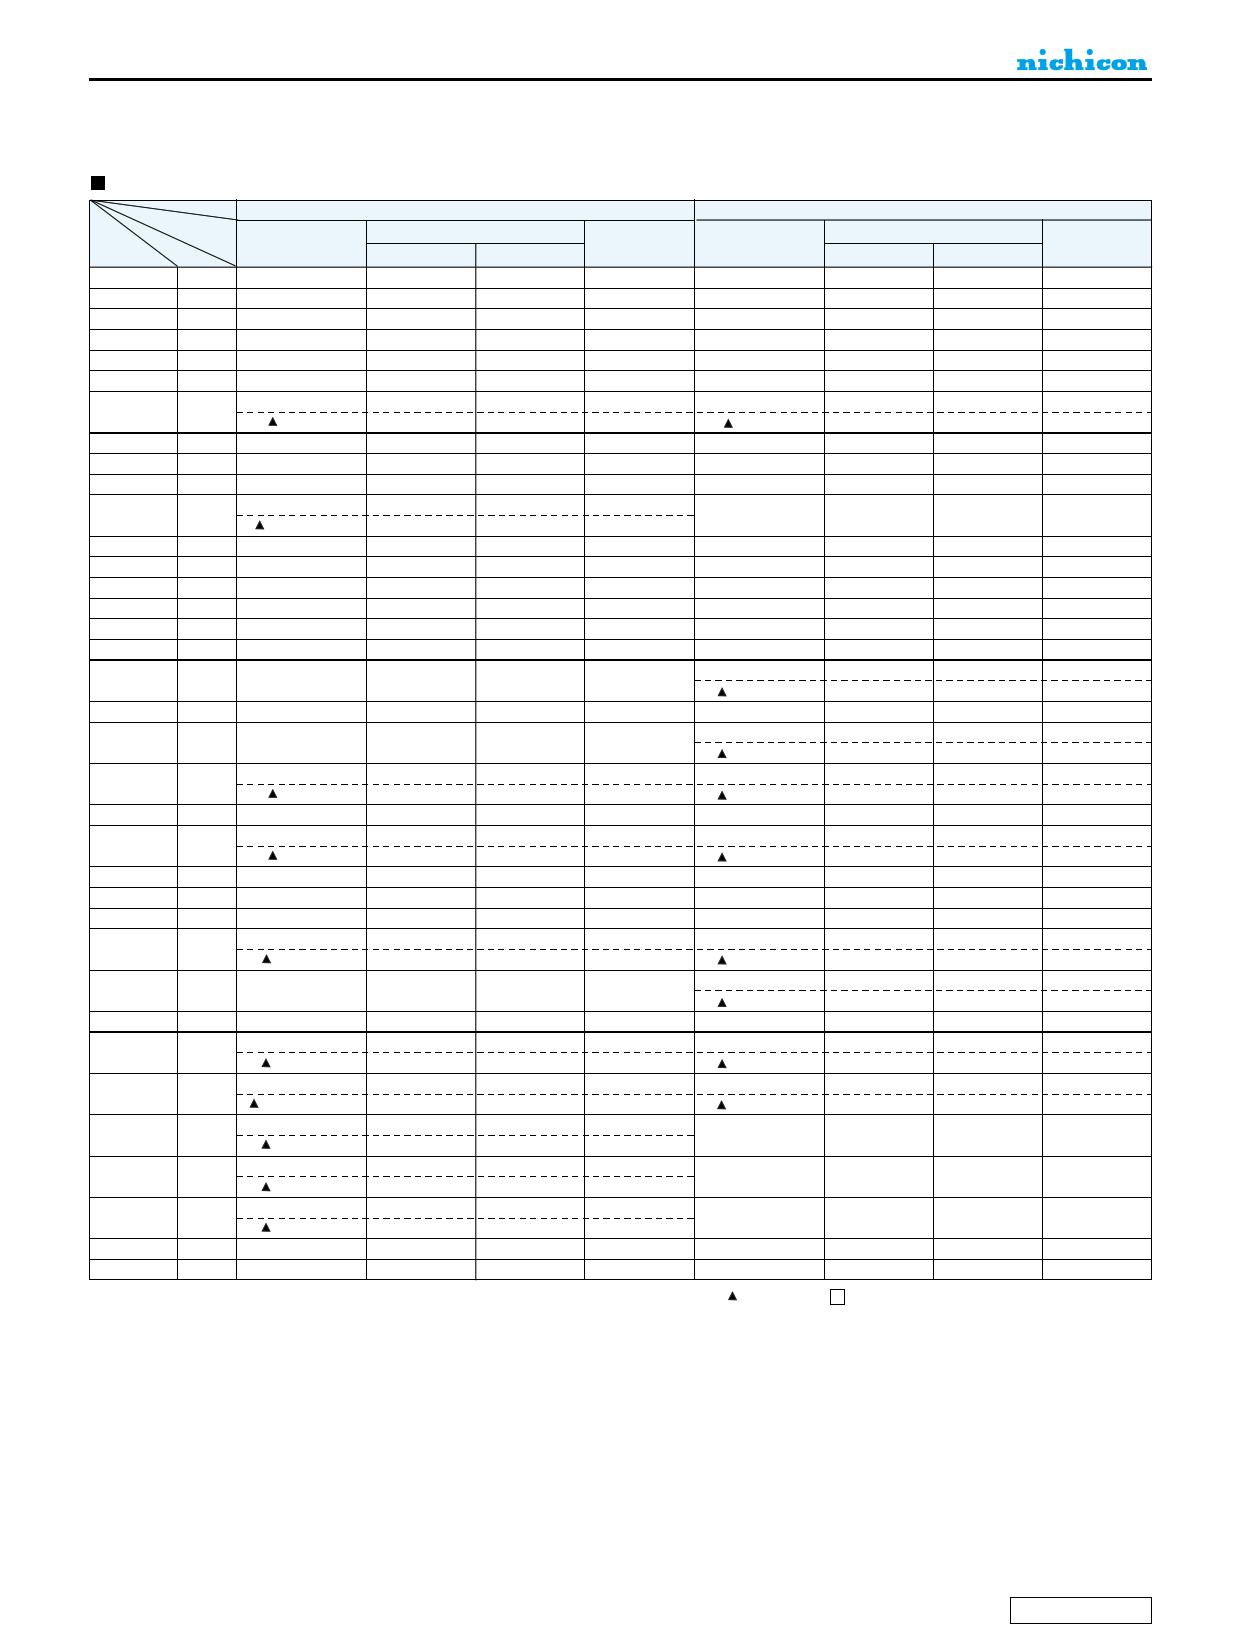 UPW1V470MED pdf, 반도체, 판매, 대치품